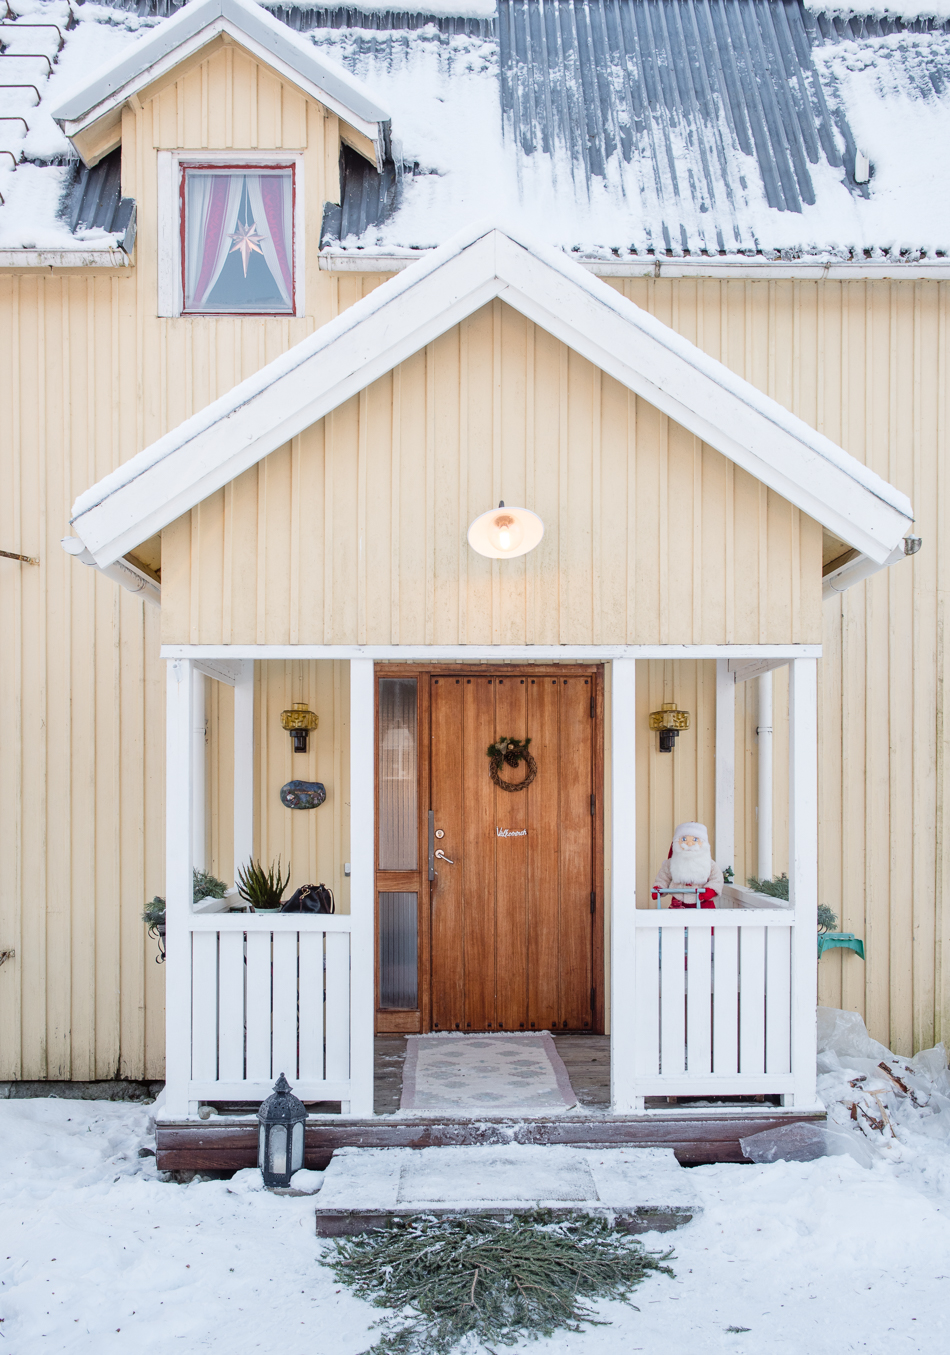 sweden-snow-blog-hannah-wilson-4